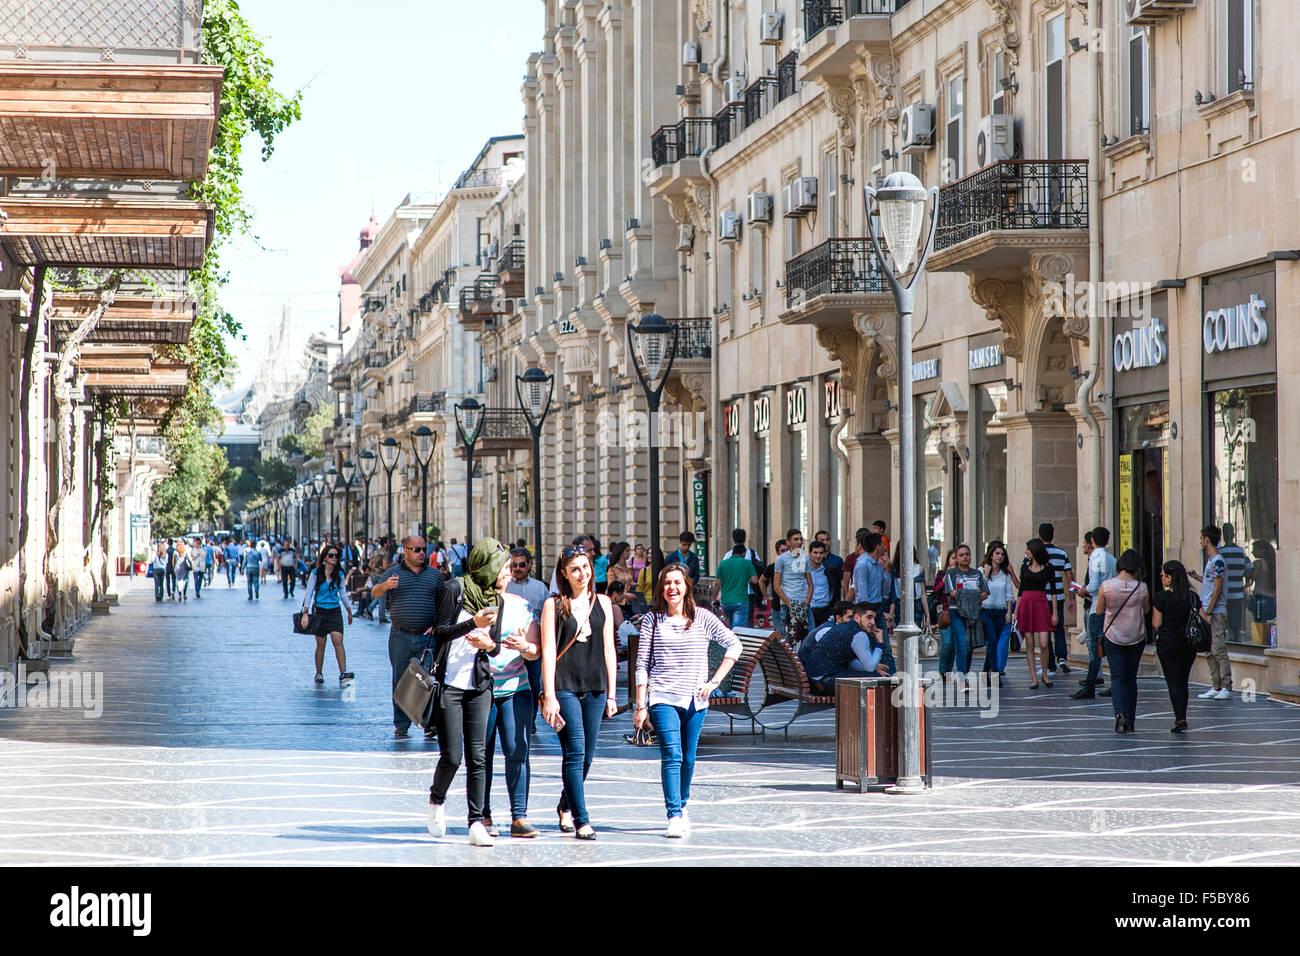 Pedestrians on Nizami street in central Baku. The street is named after classical poet Nizami Ganjavi. Stock Photo